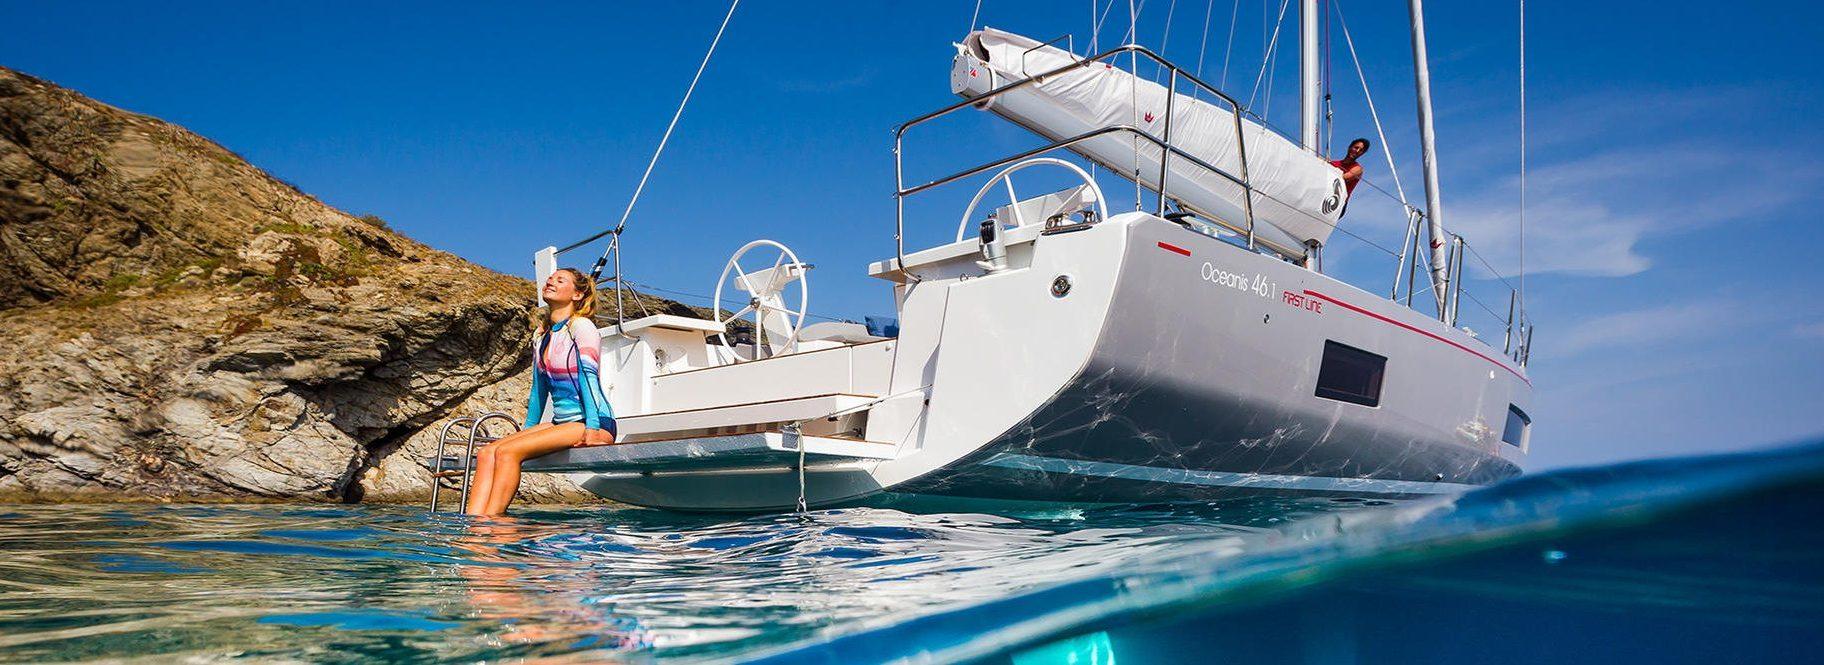 Beneteau Oceanis 46 1 G Winter S Sailing Center